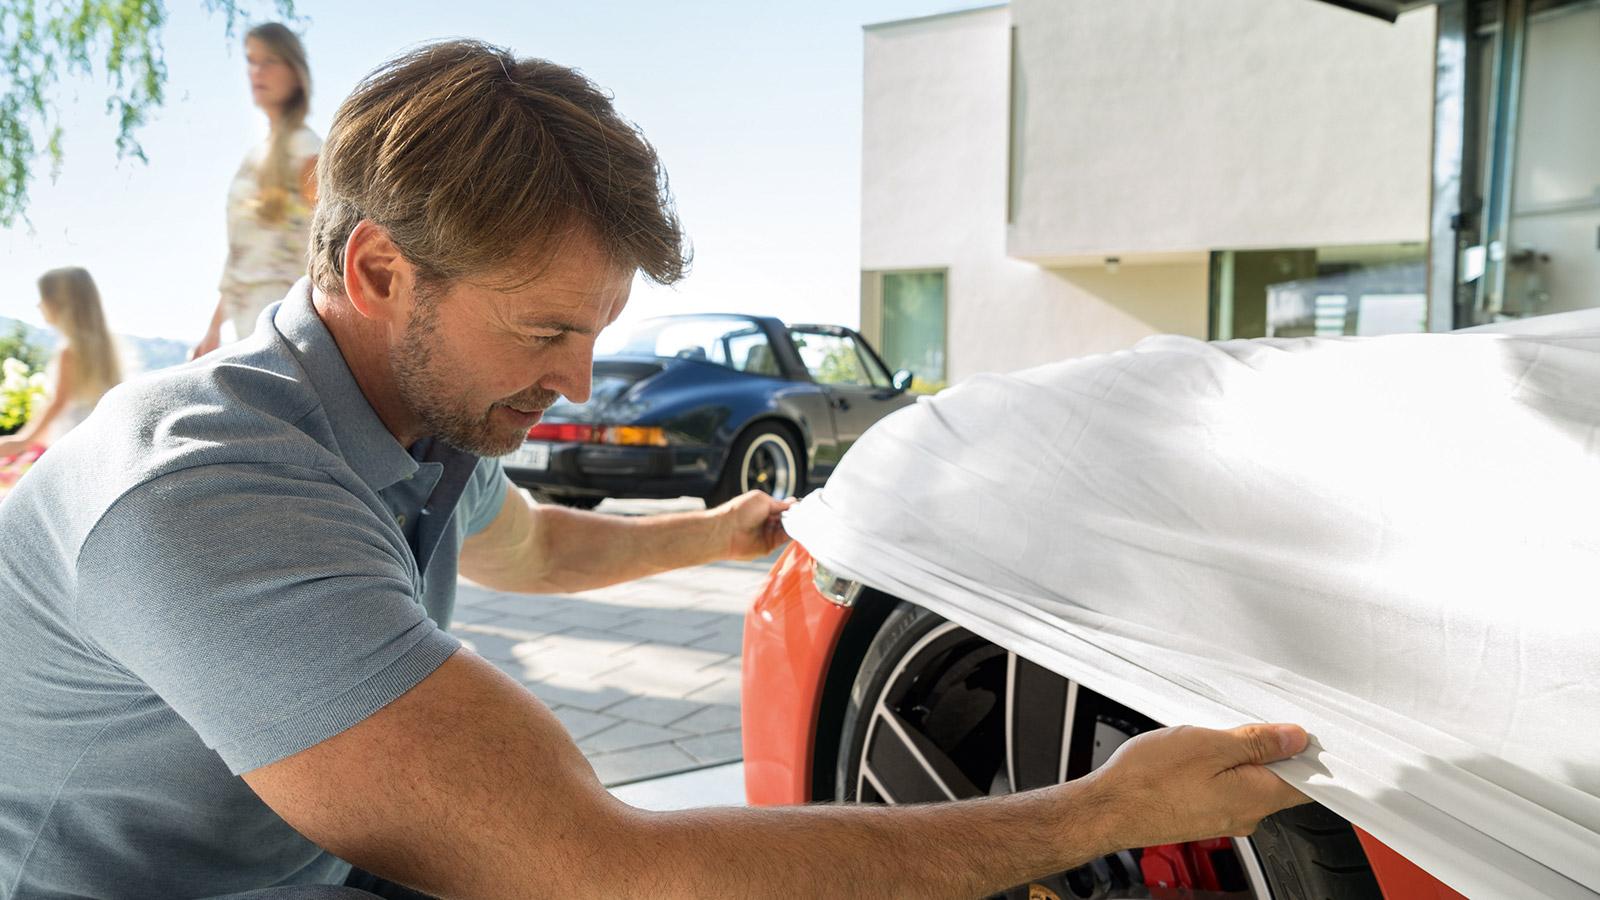 Porsche - Capas protetoras para veículos